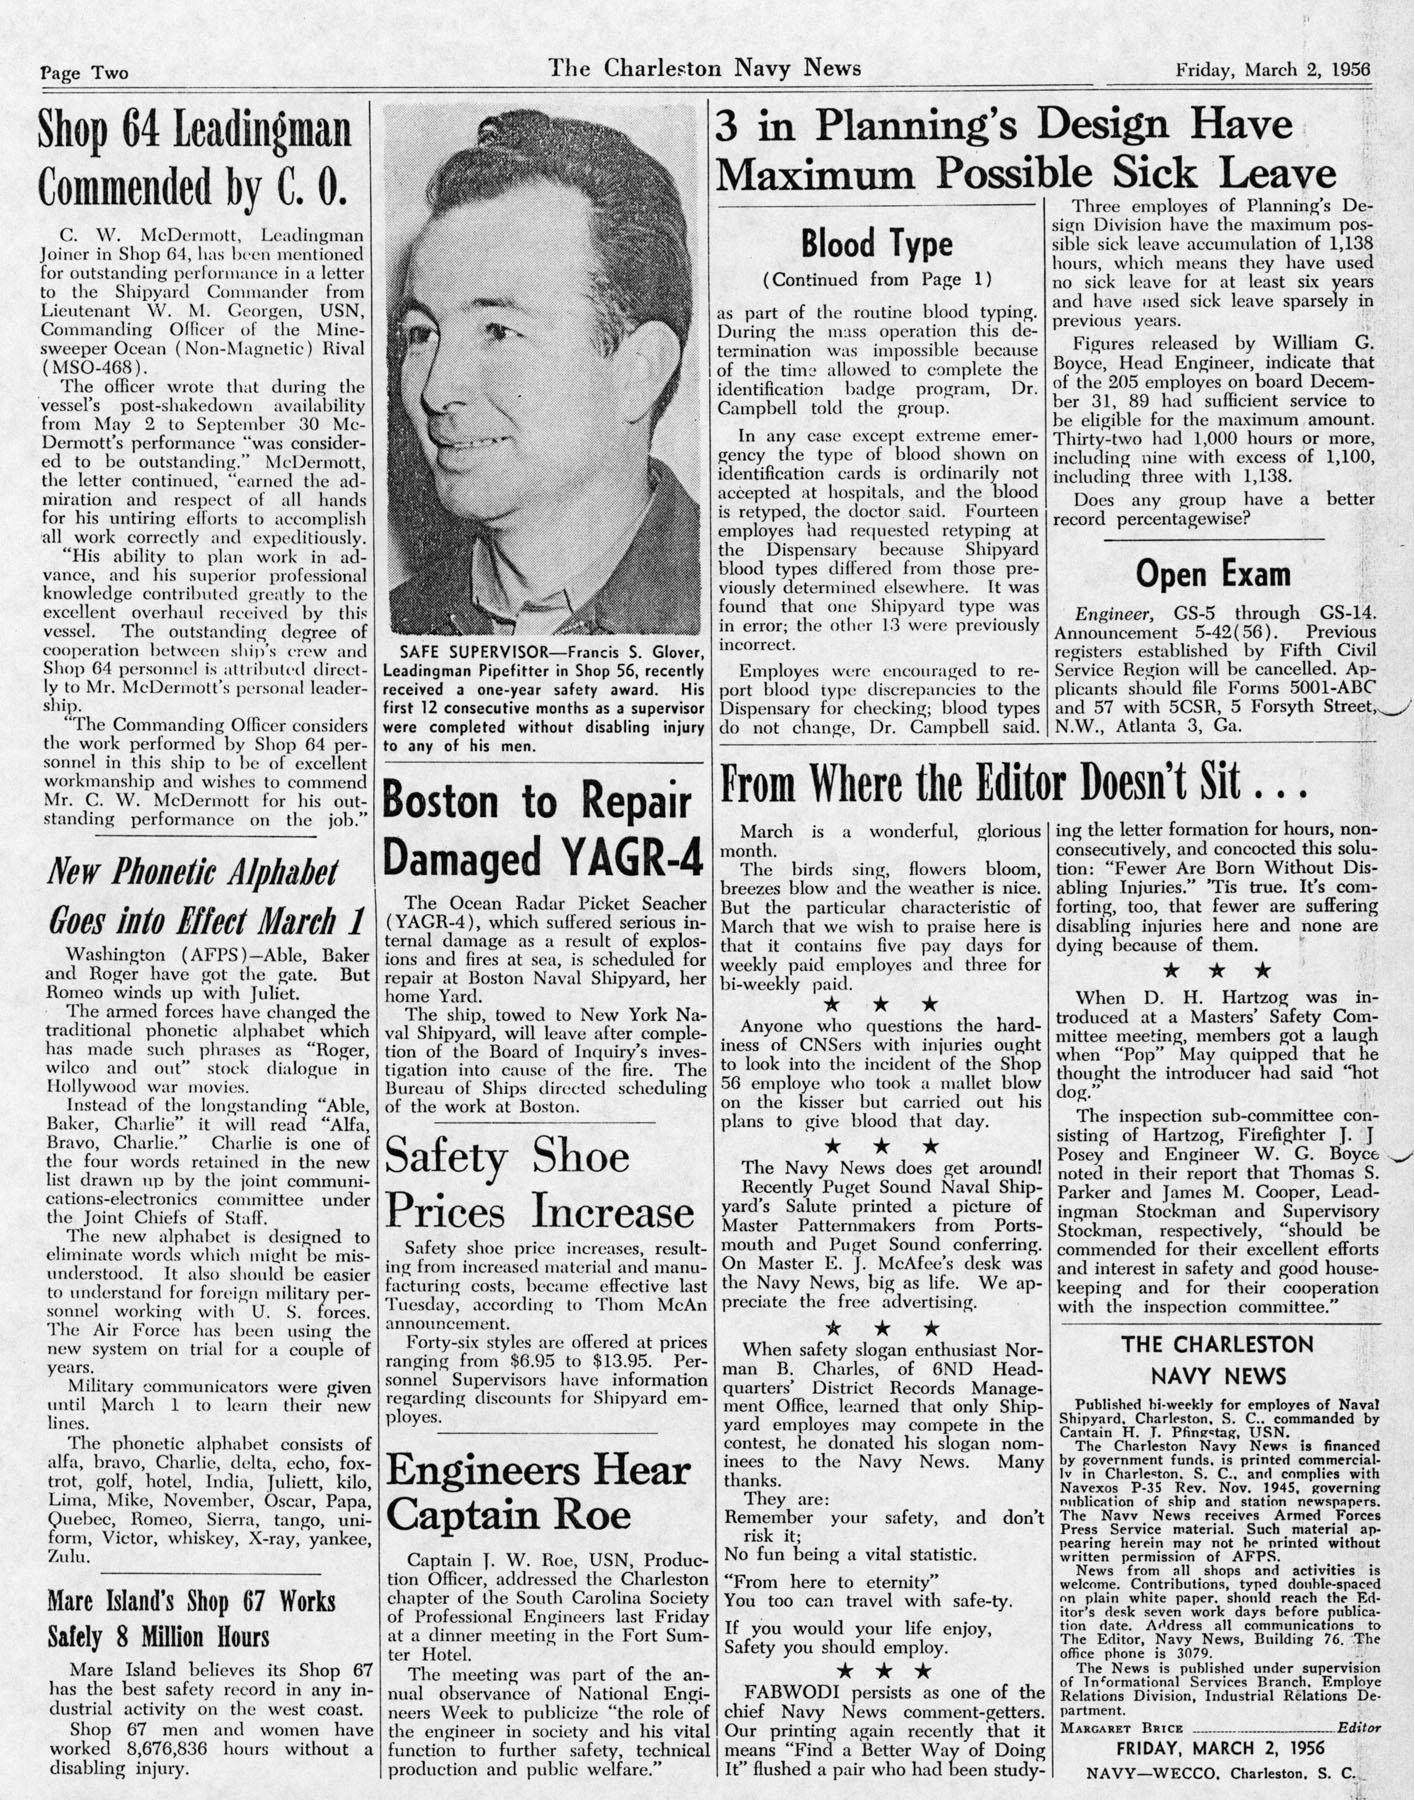 The Charleston Navy News, Volume 14, Edition 16, page ii